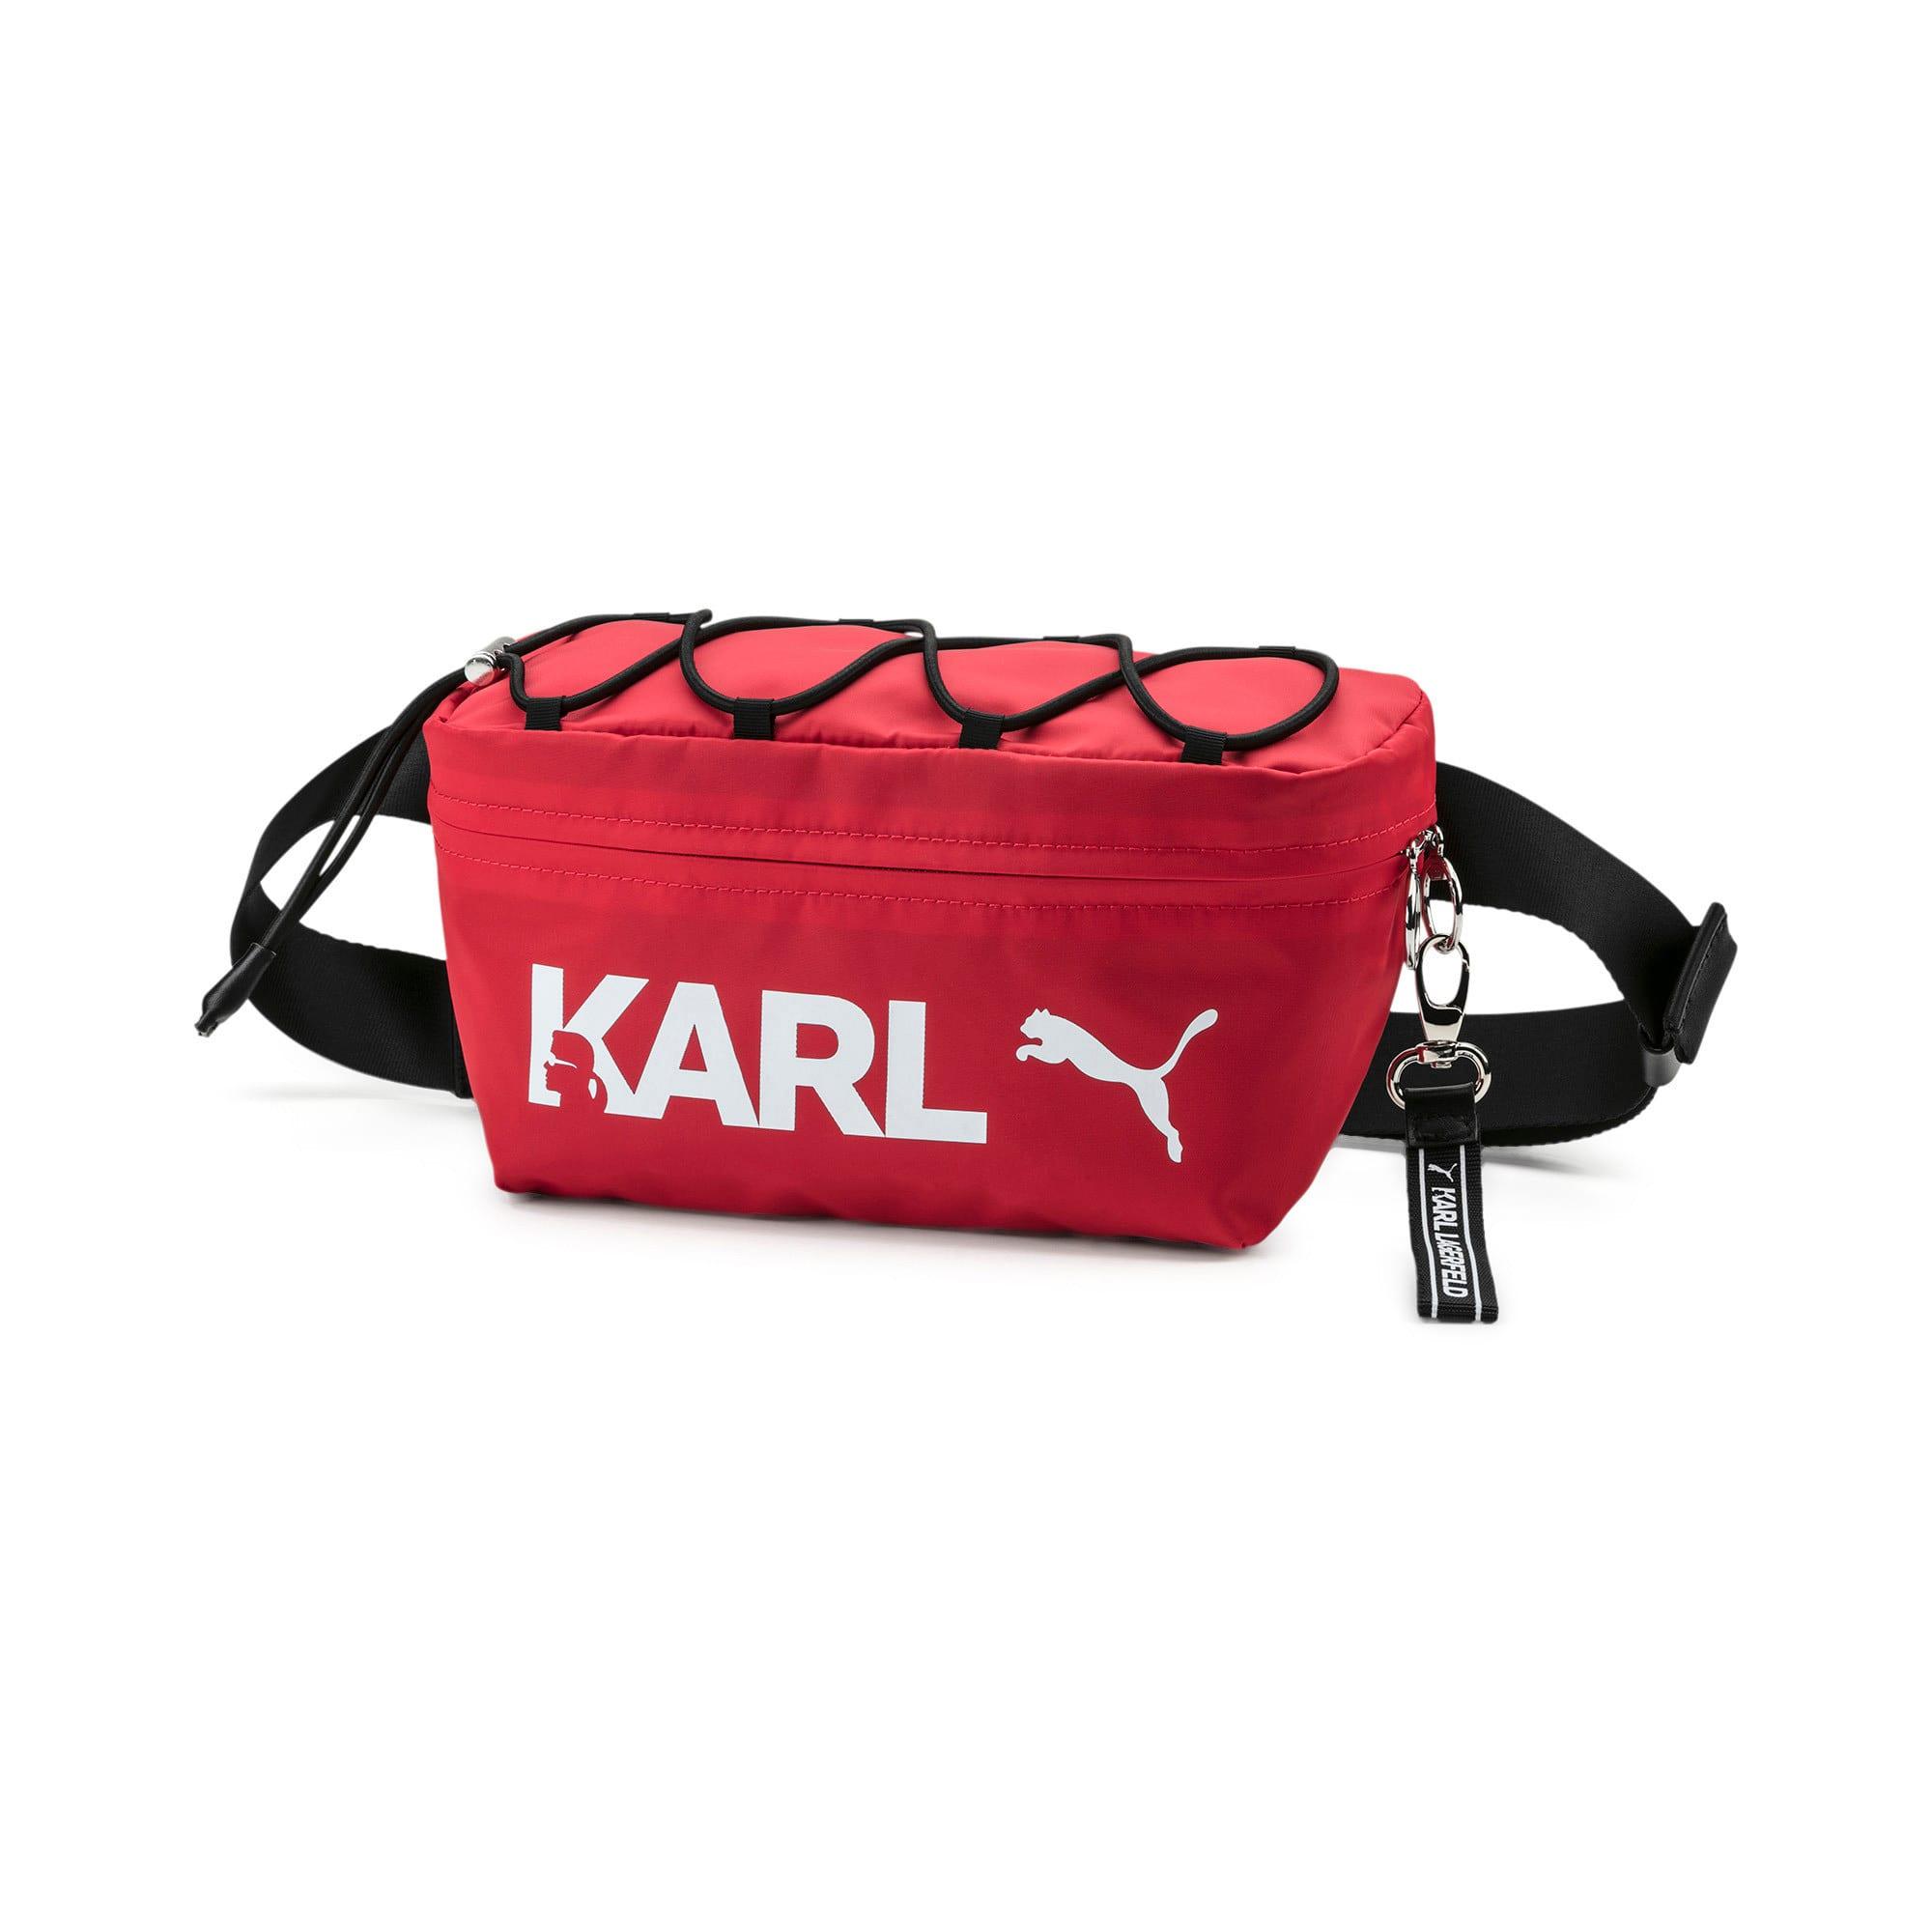 Thumbnail 1 of PUMA x KARL LAGERFELD Waist Bag, High Risk Red-Puma Black, medium